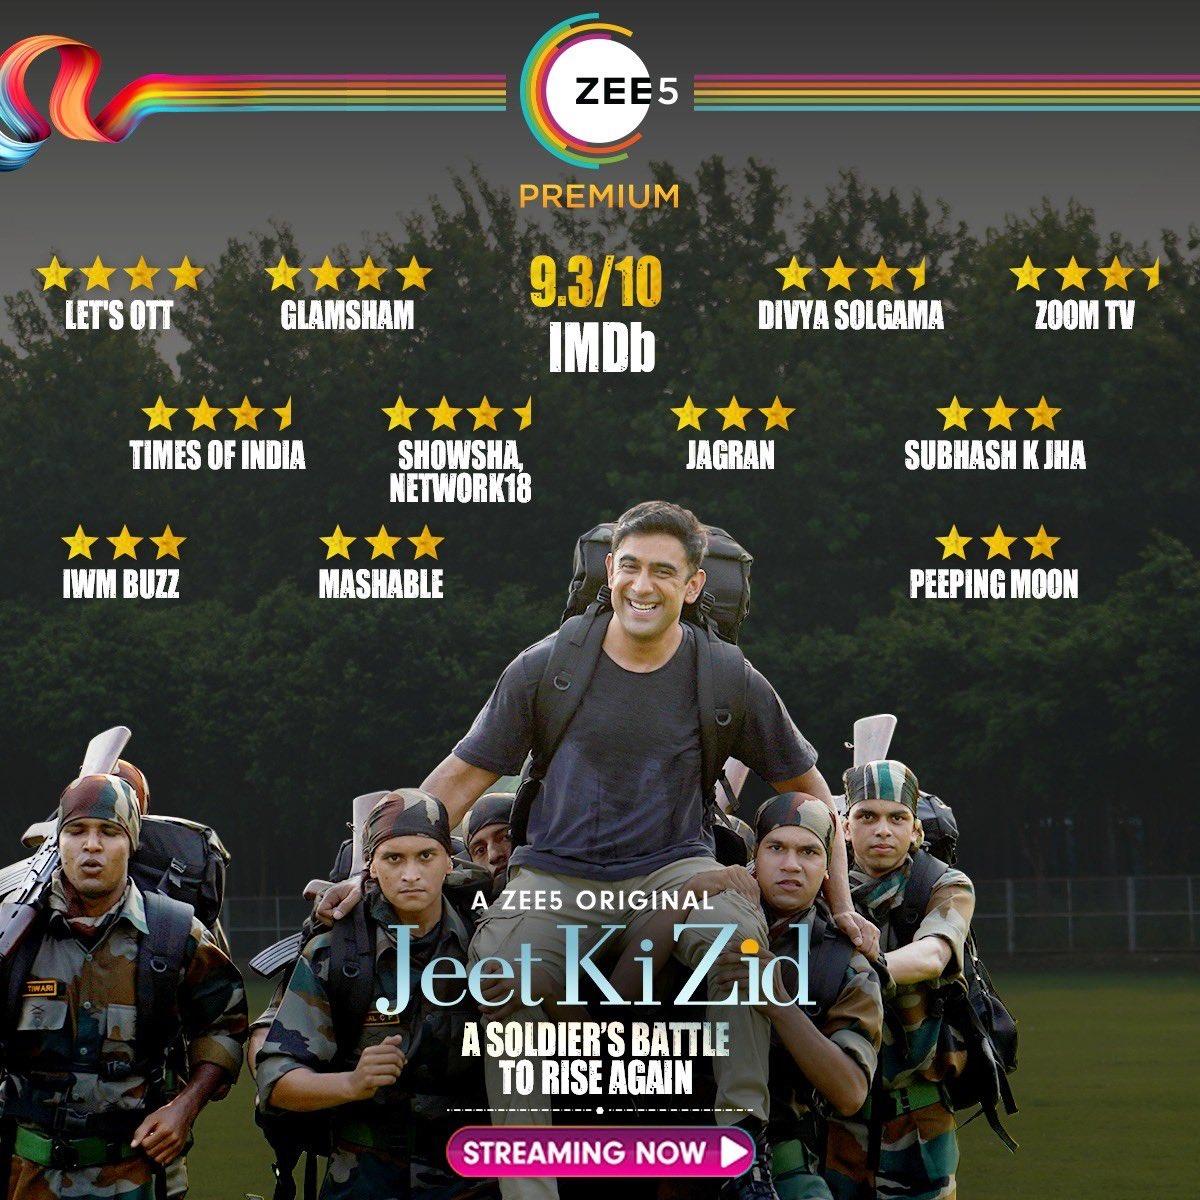 A star studded welcome shines on the tale of the Legendary Kargil War Hero, Major Deep ✨ #JeetKiZid Streaming Now!    @theamitsadh #AmritaPuri @freshlimefilms @BayViewProjOffl @akash77 @JoyArunava @sushant_says @AlyGoni @vish2vish @ZEE5Premium